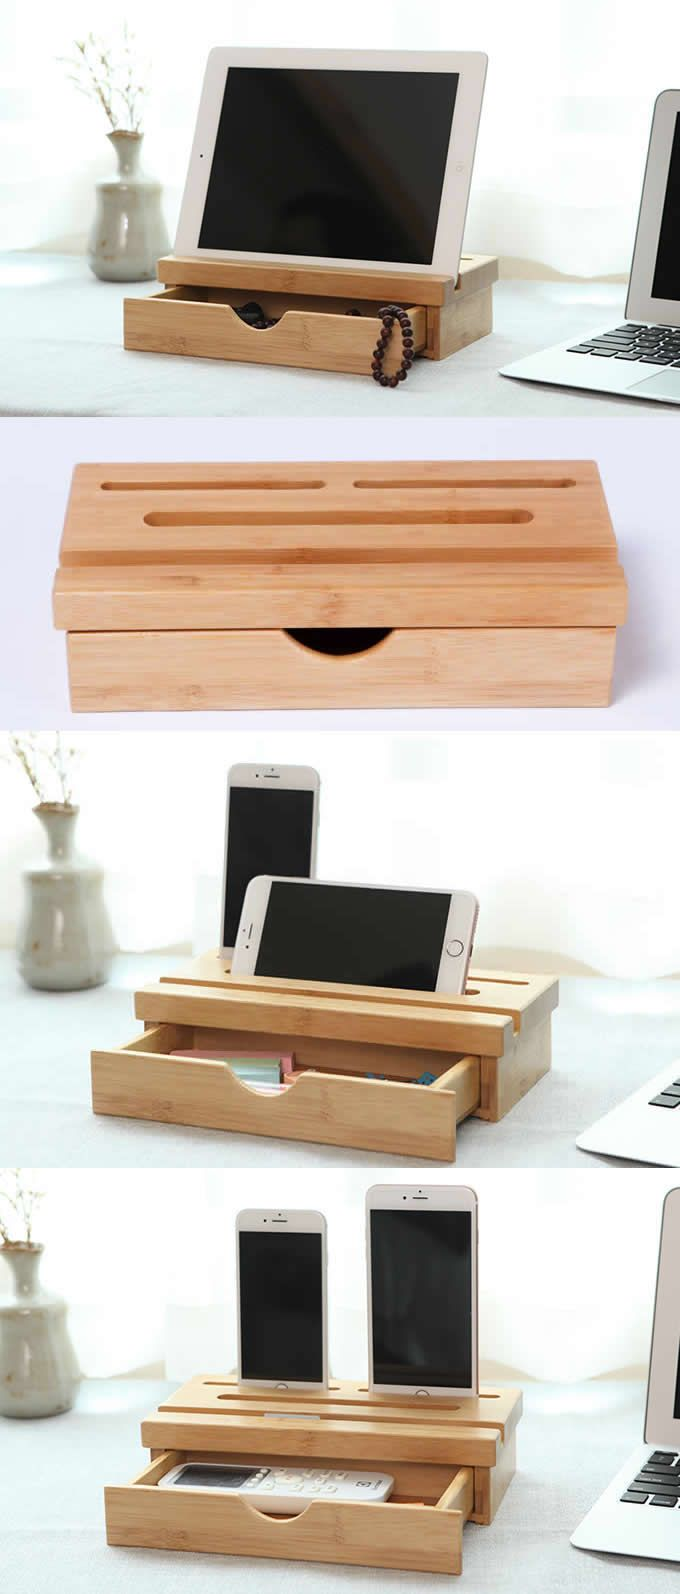 Wooden Bamboo Stationery Drawer Organizer Ipad Phone Stand